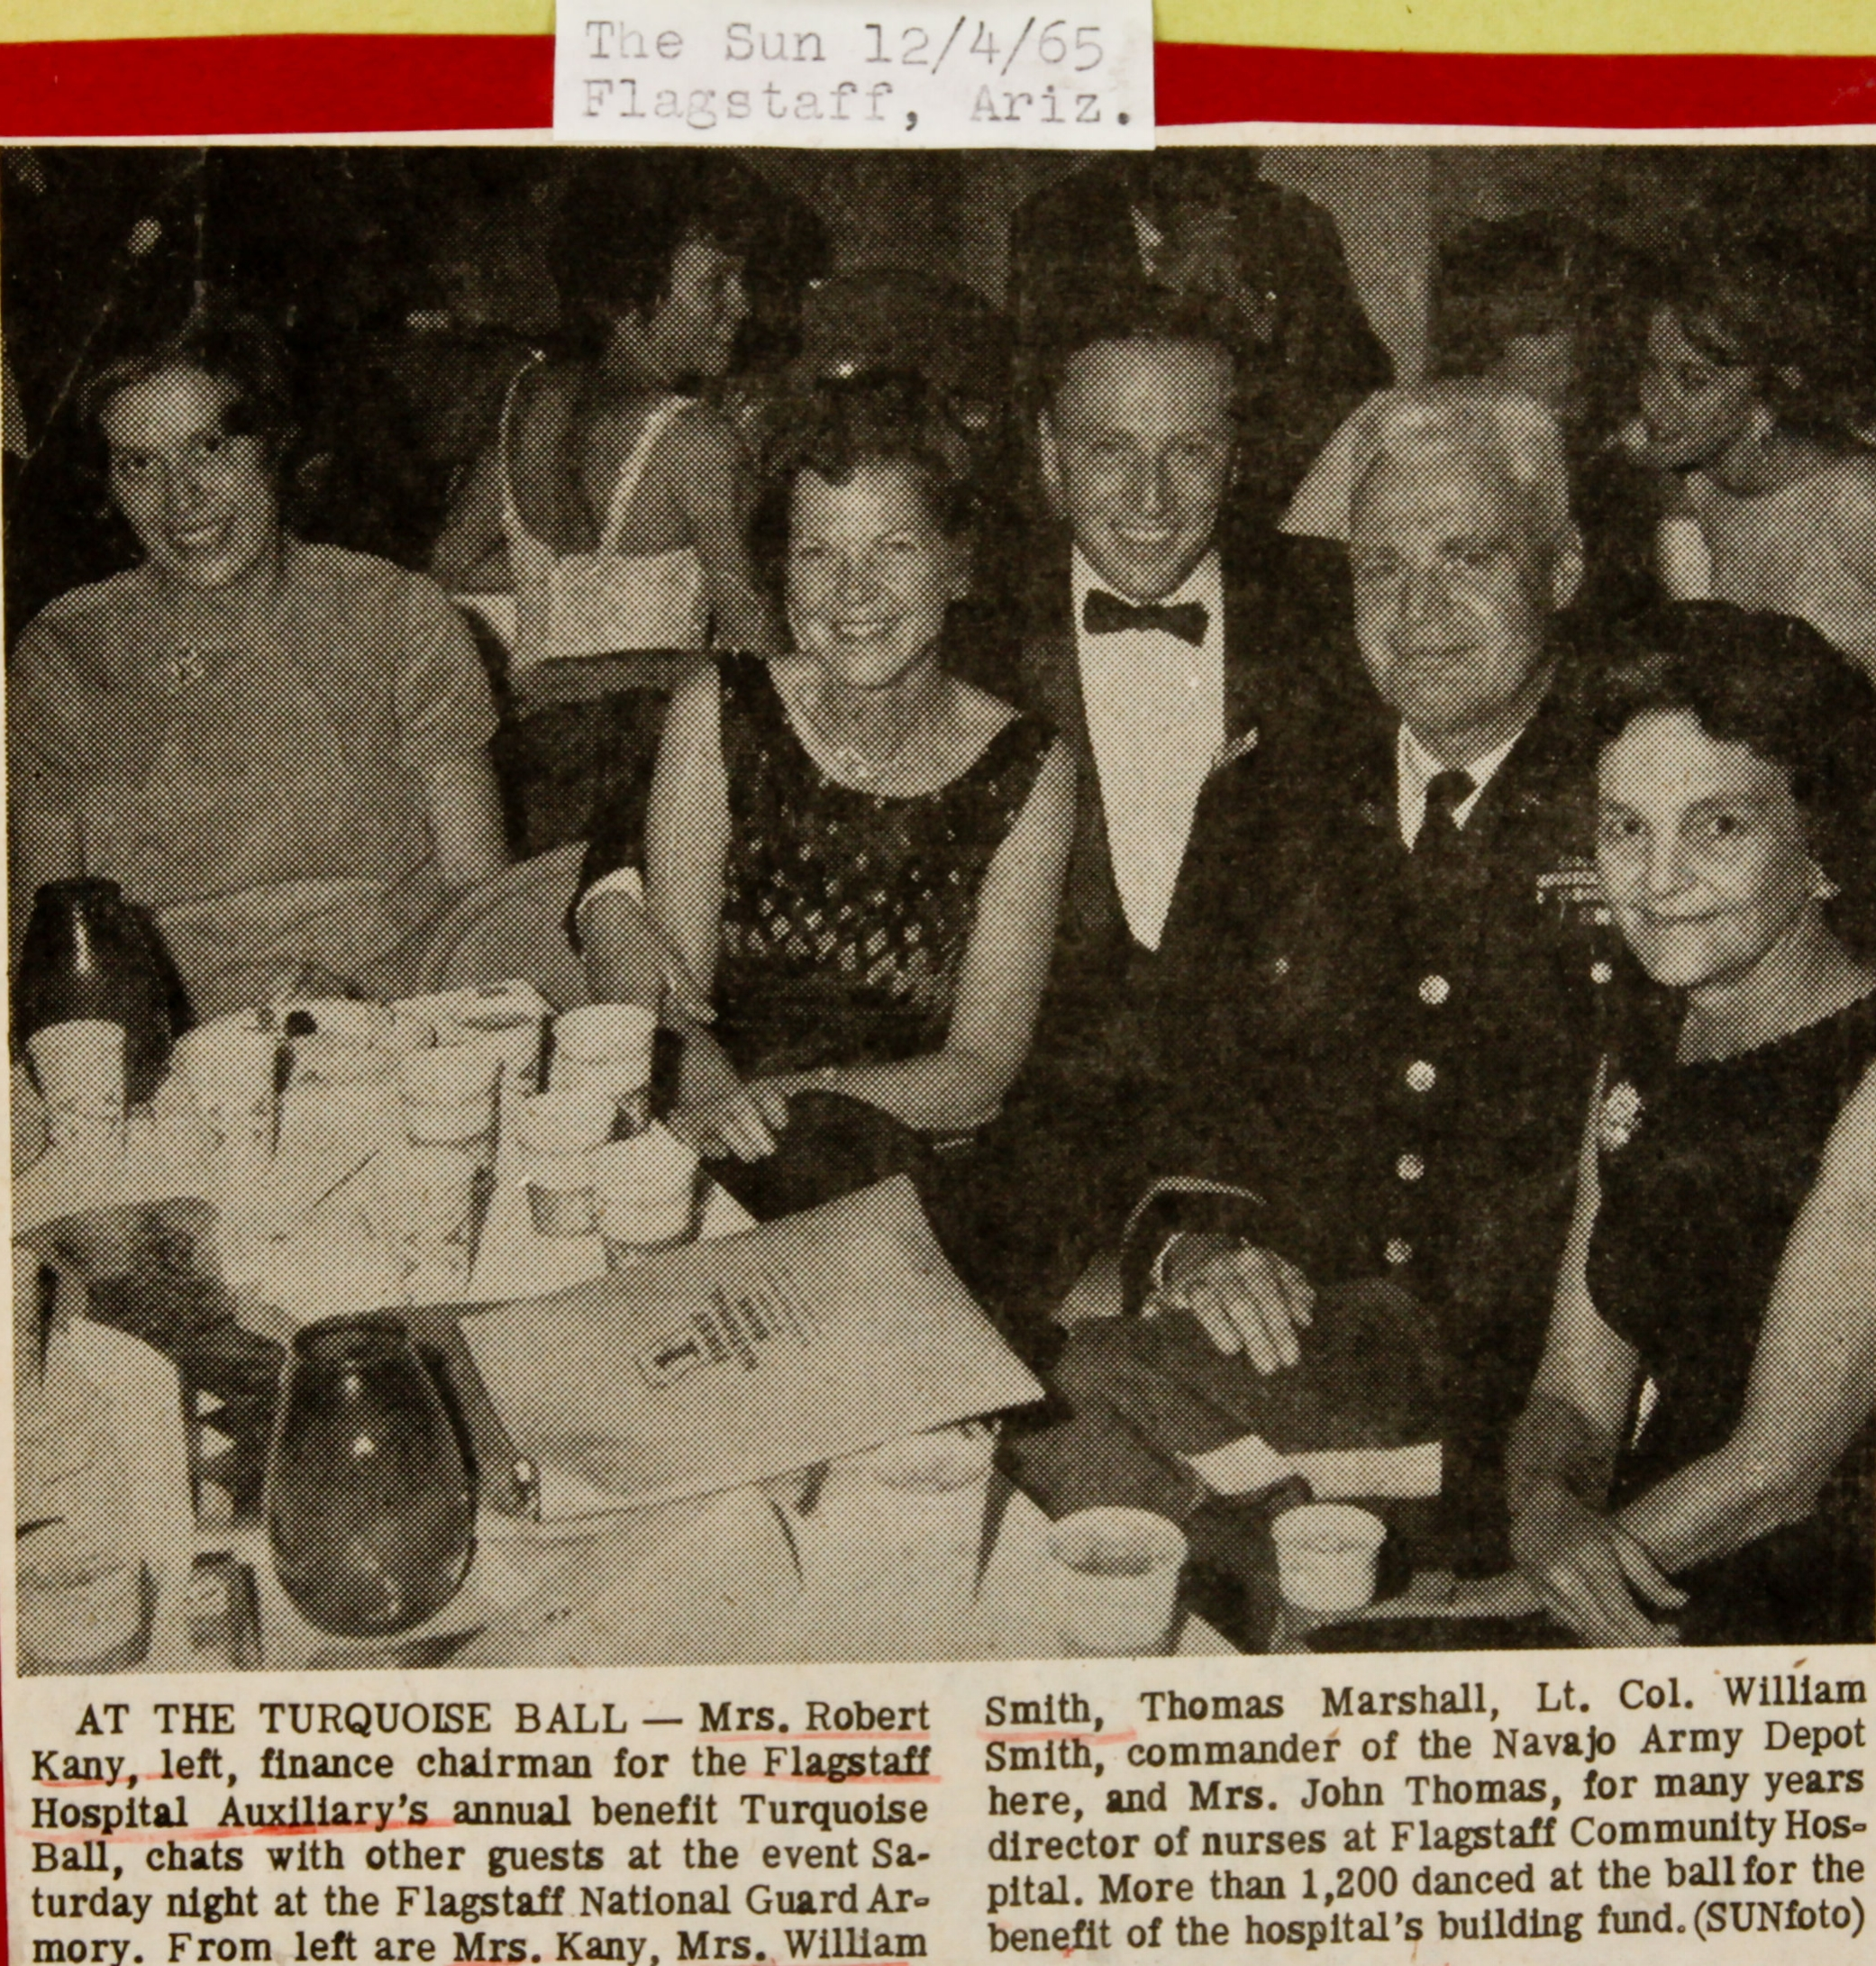 19651204_Turquoise_history_363.jpg